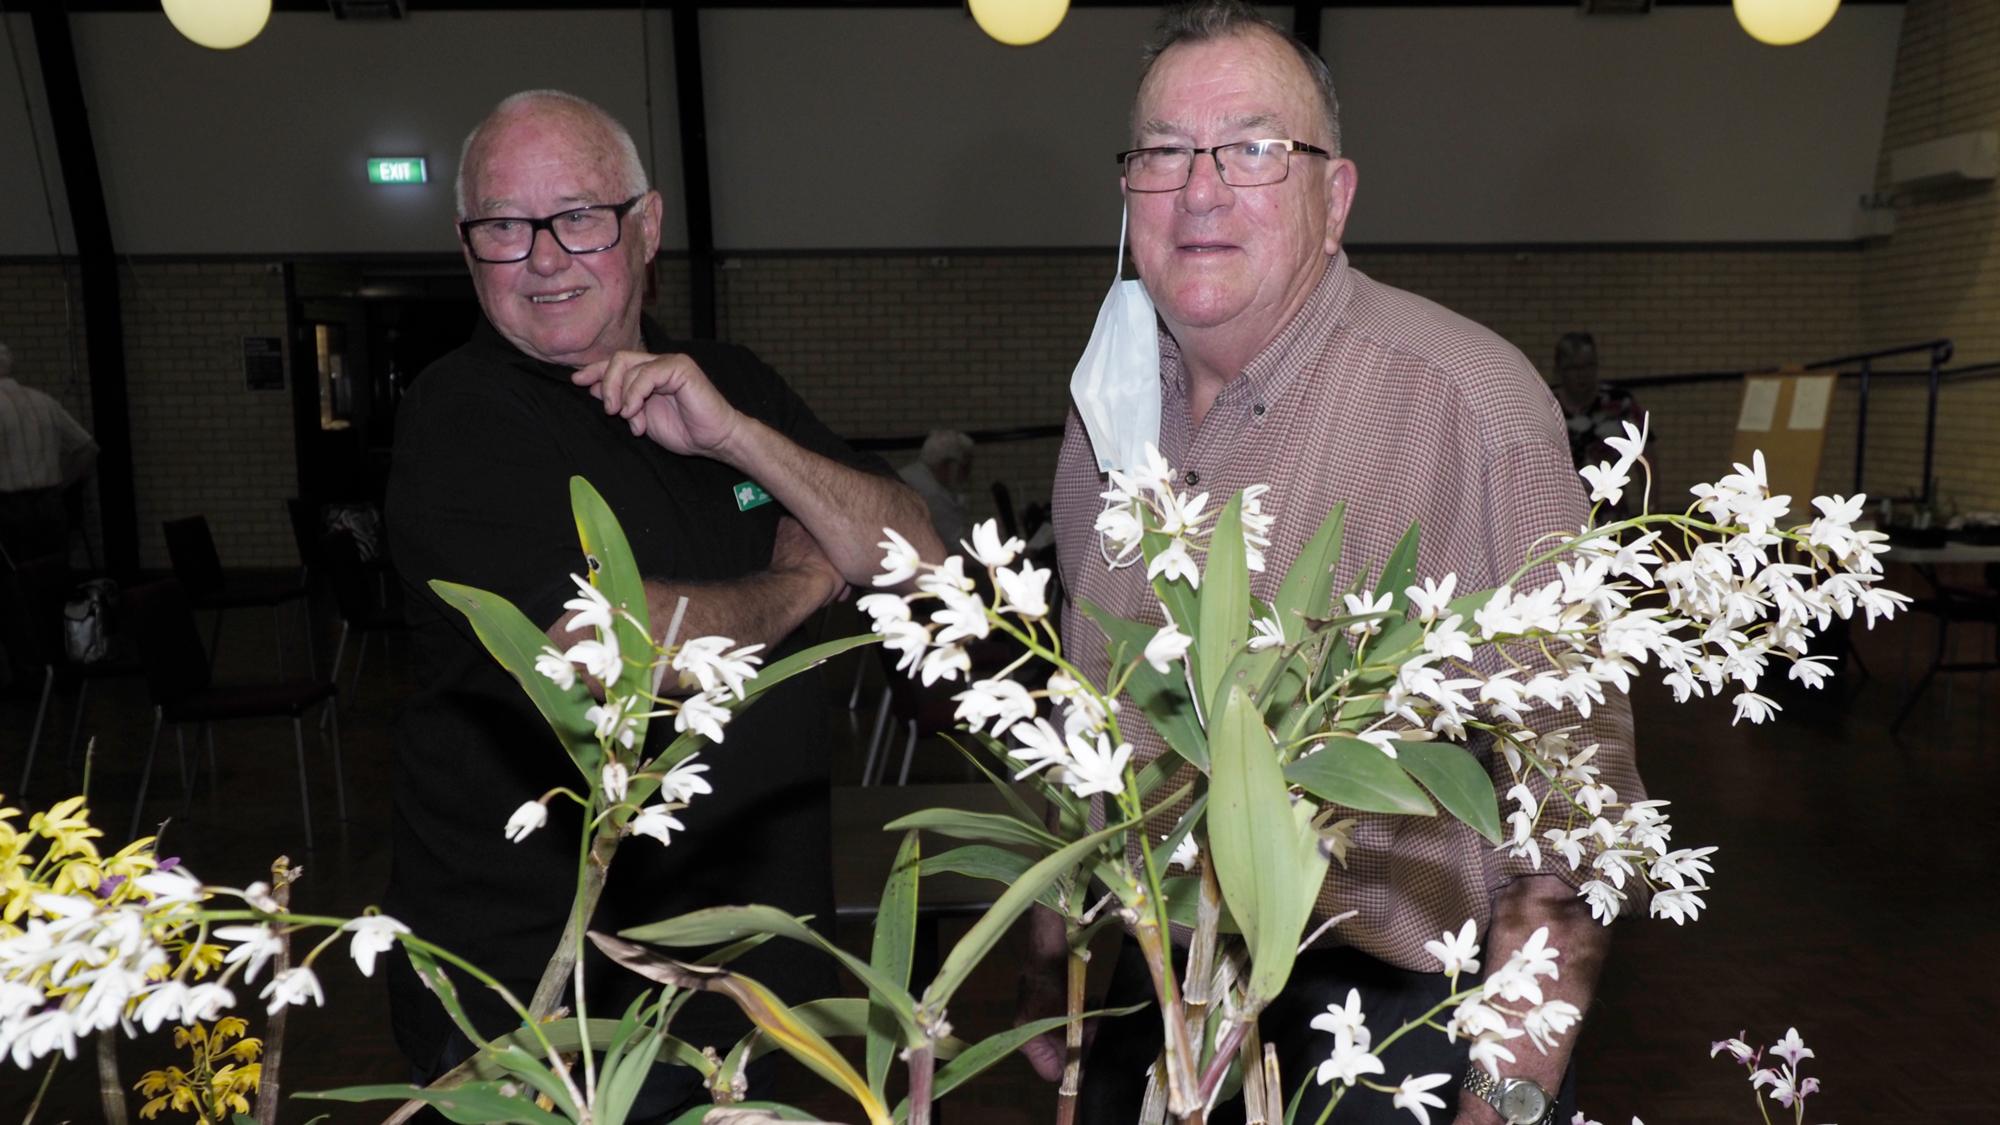 John and Don